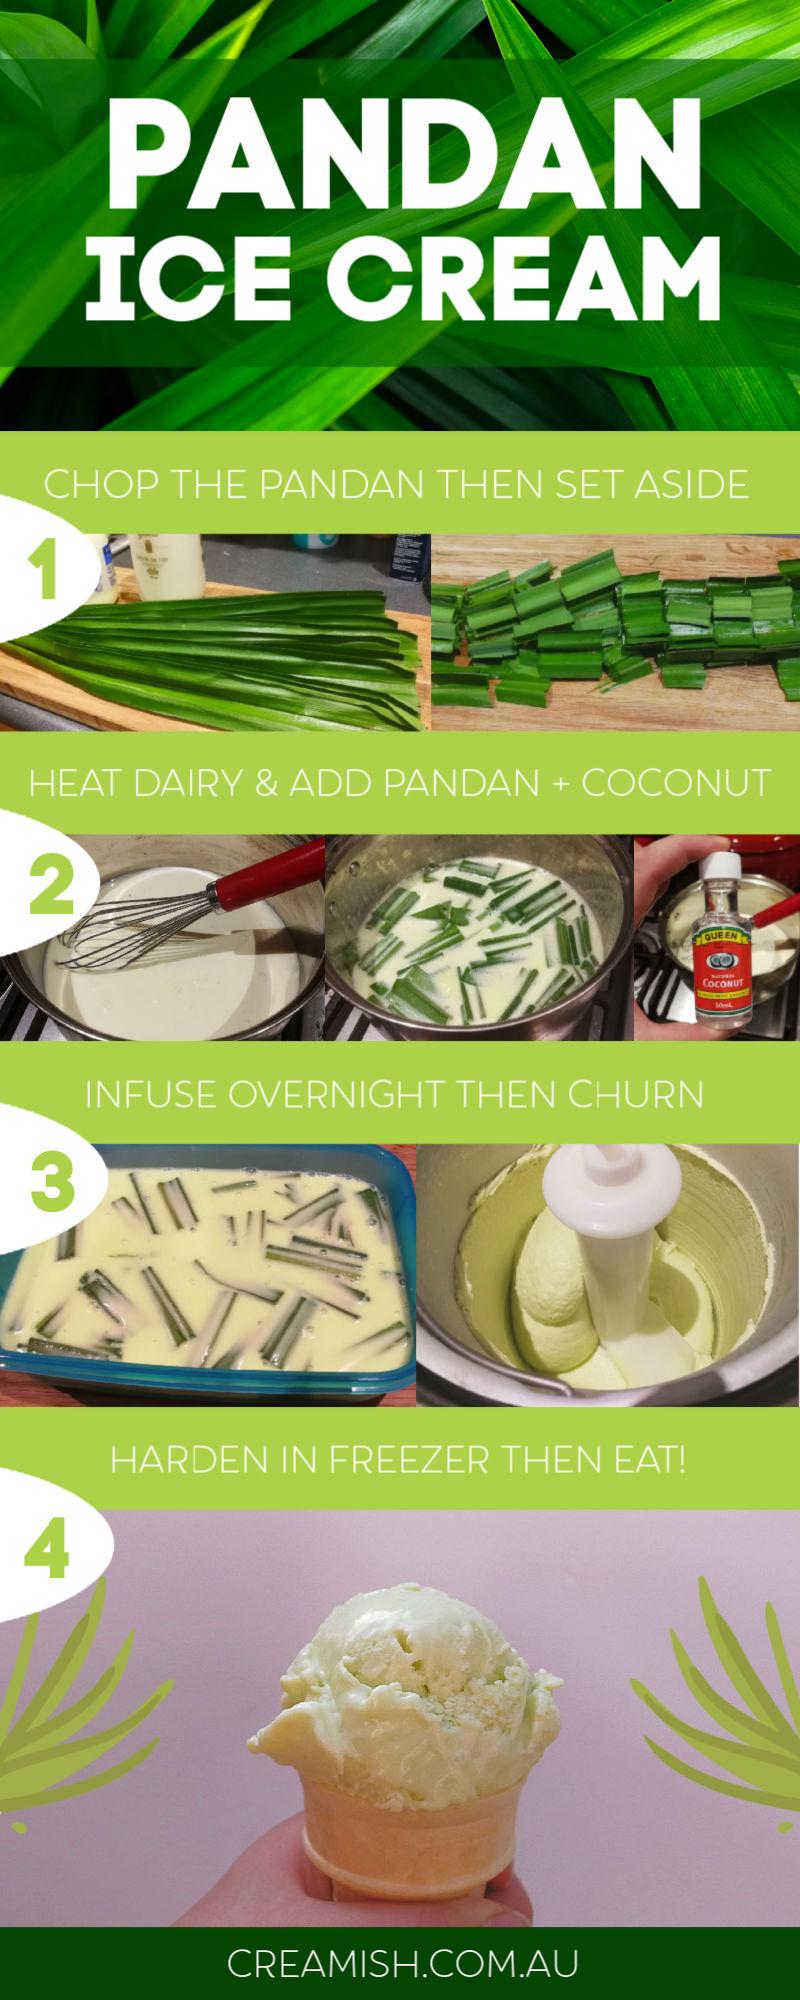 How to make pandan ice cream